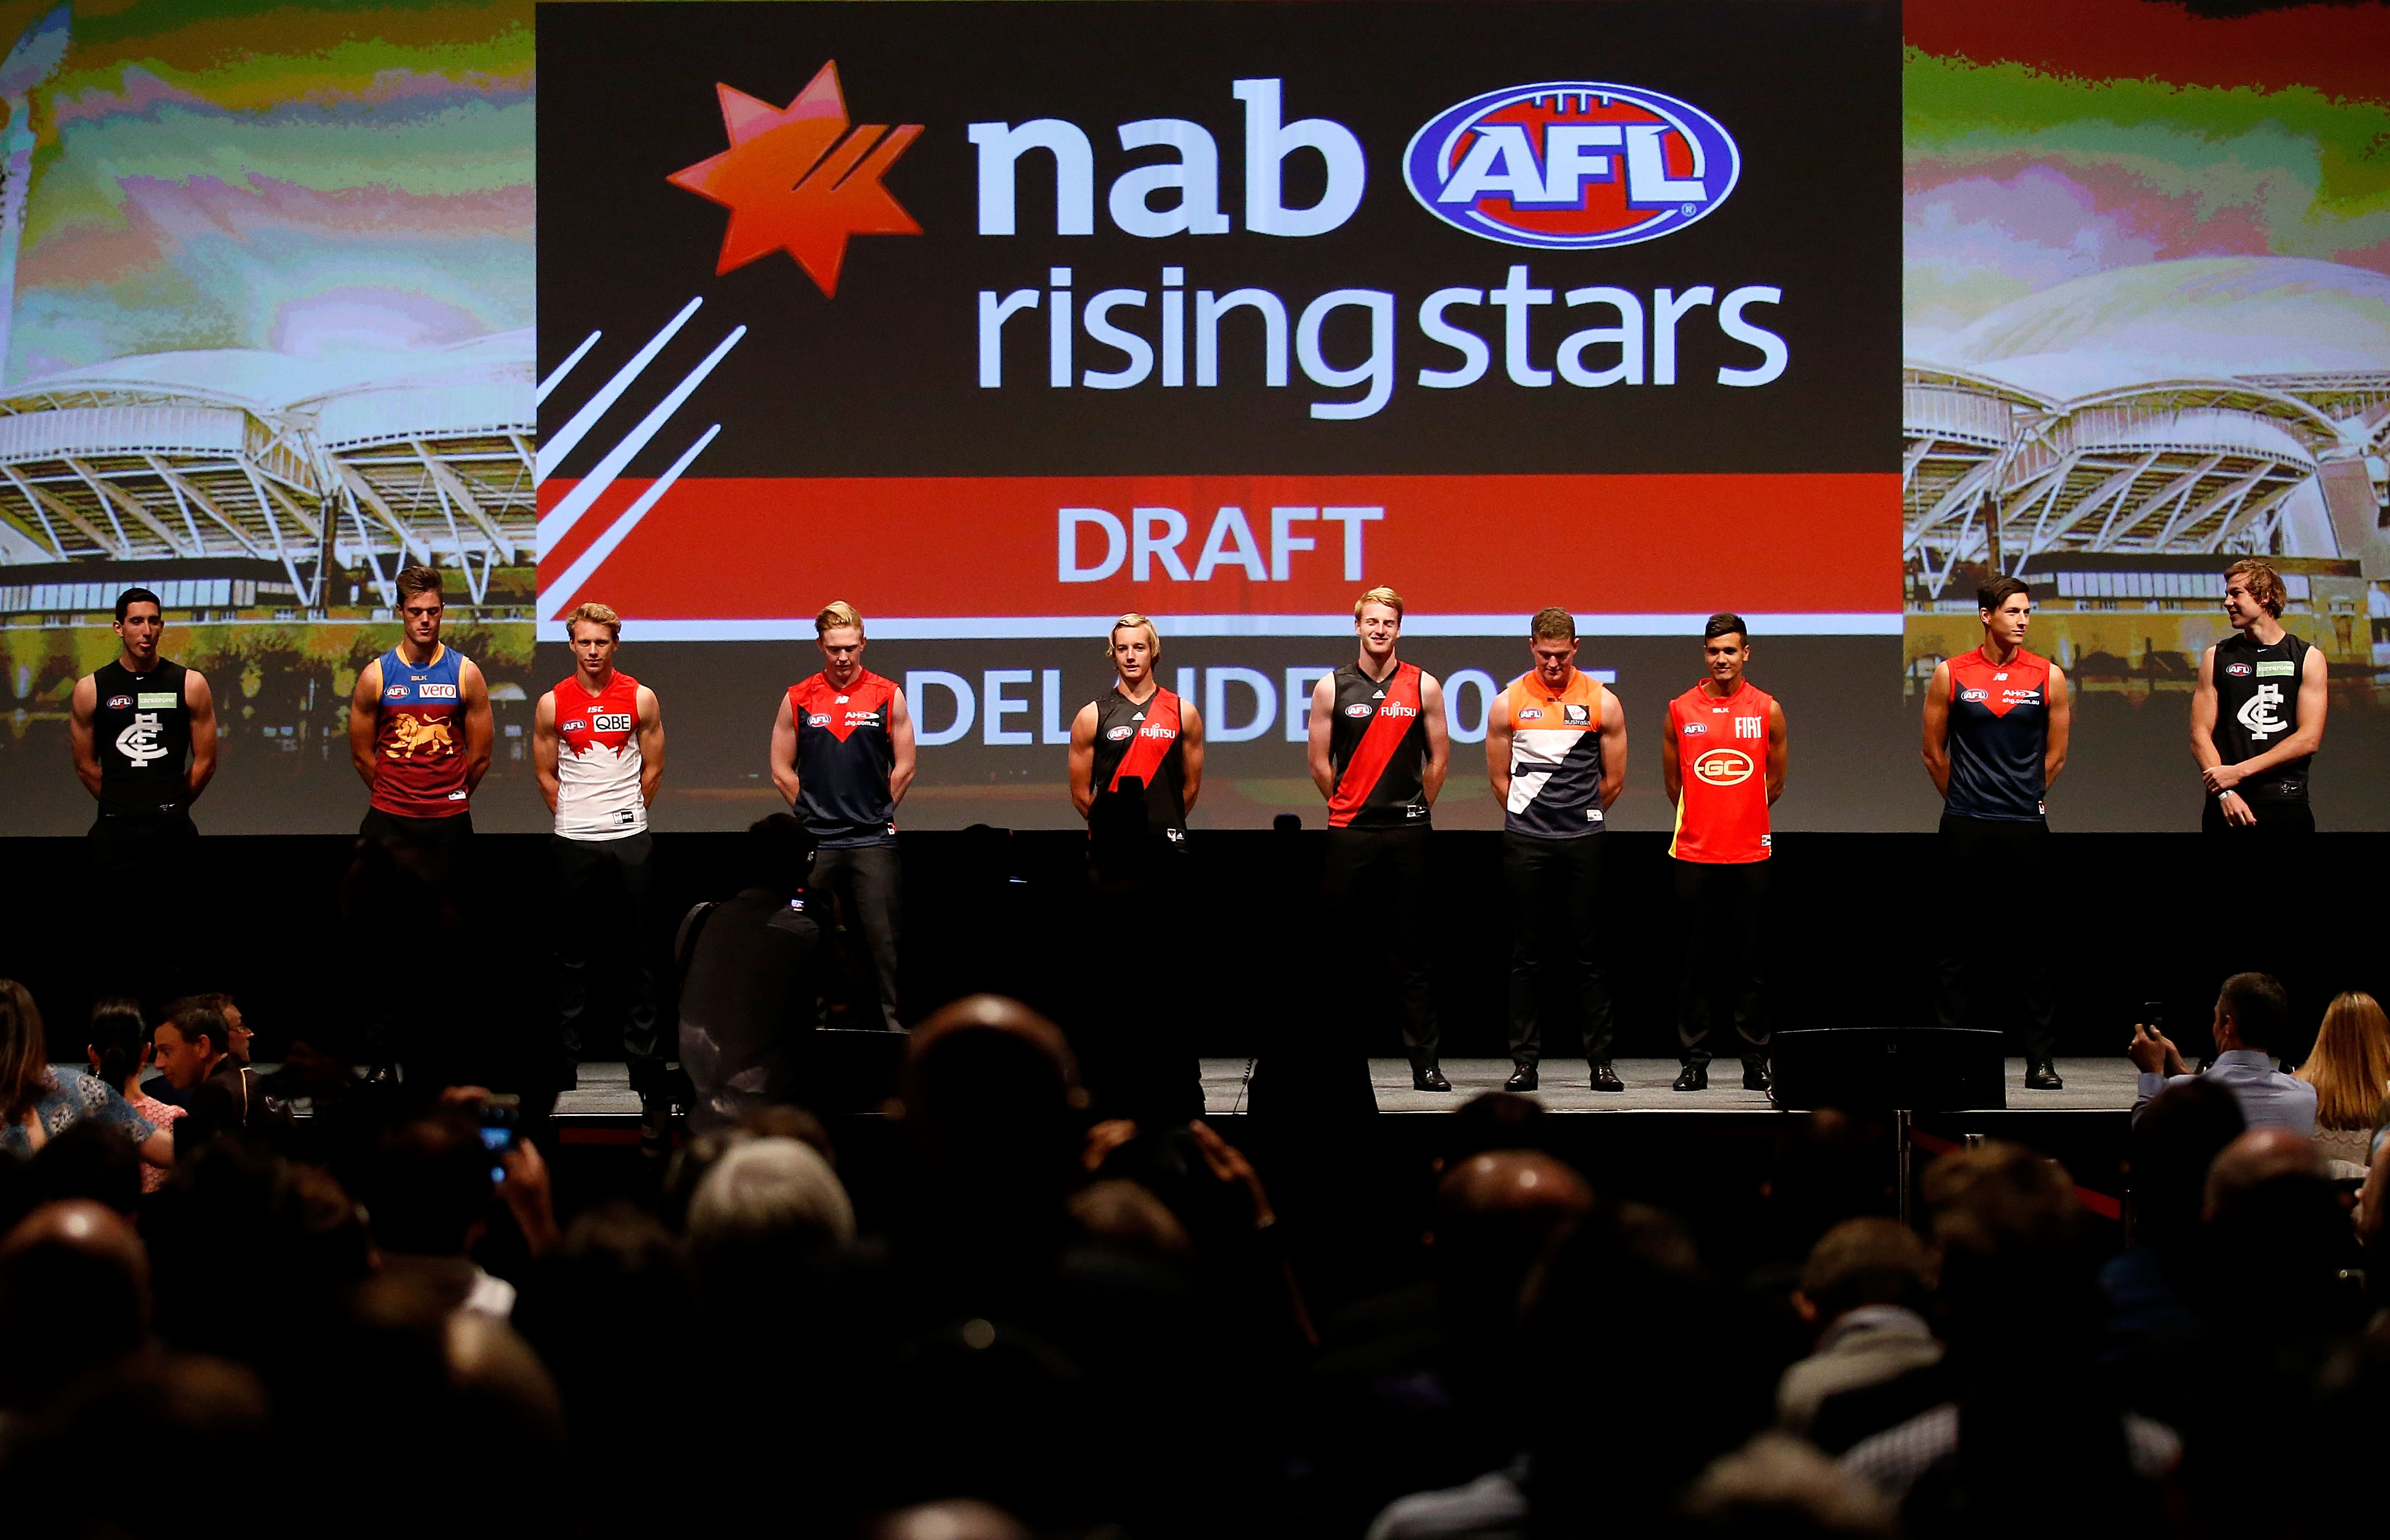 NAB AFL Draft